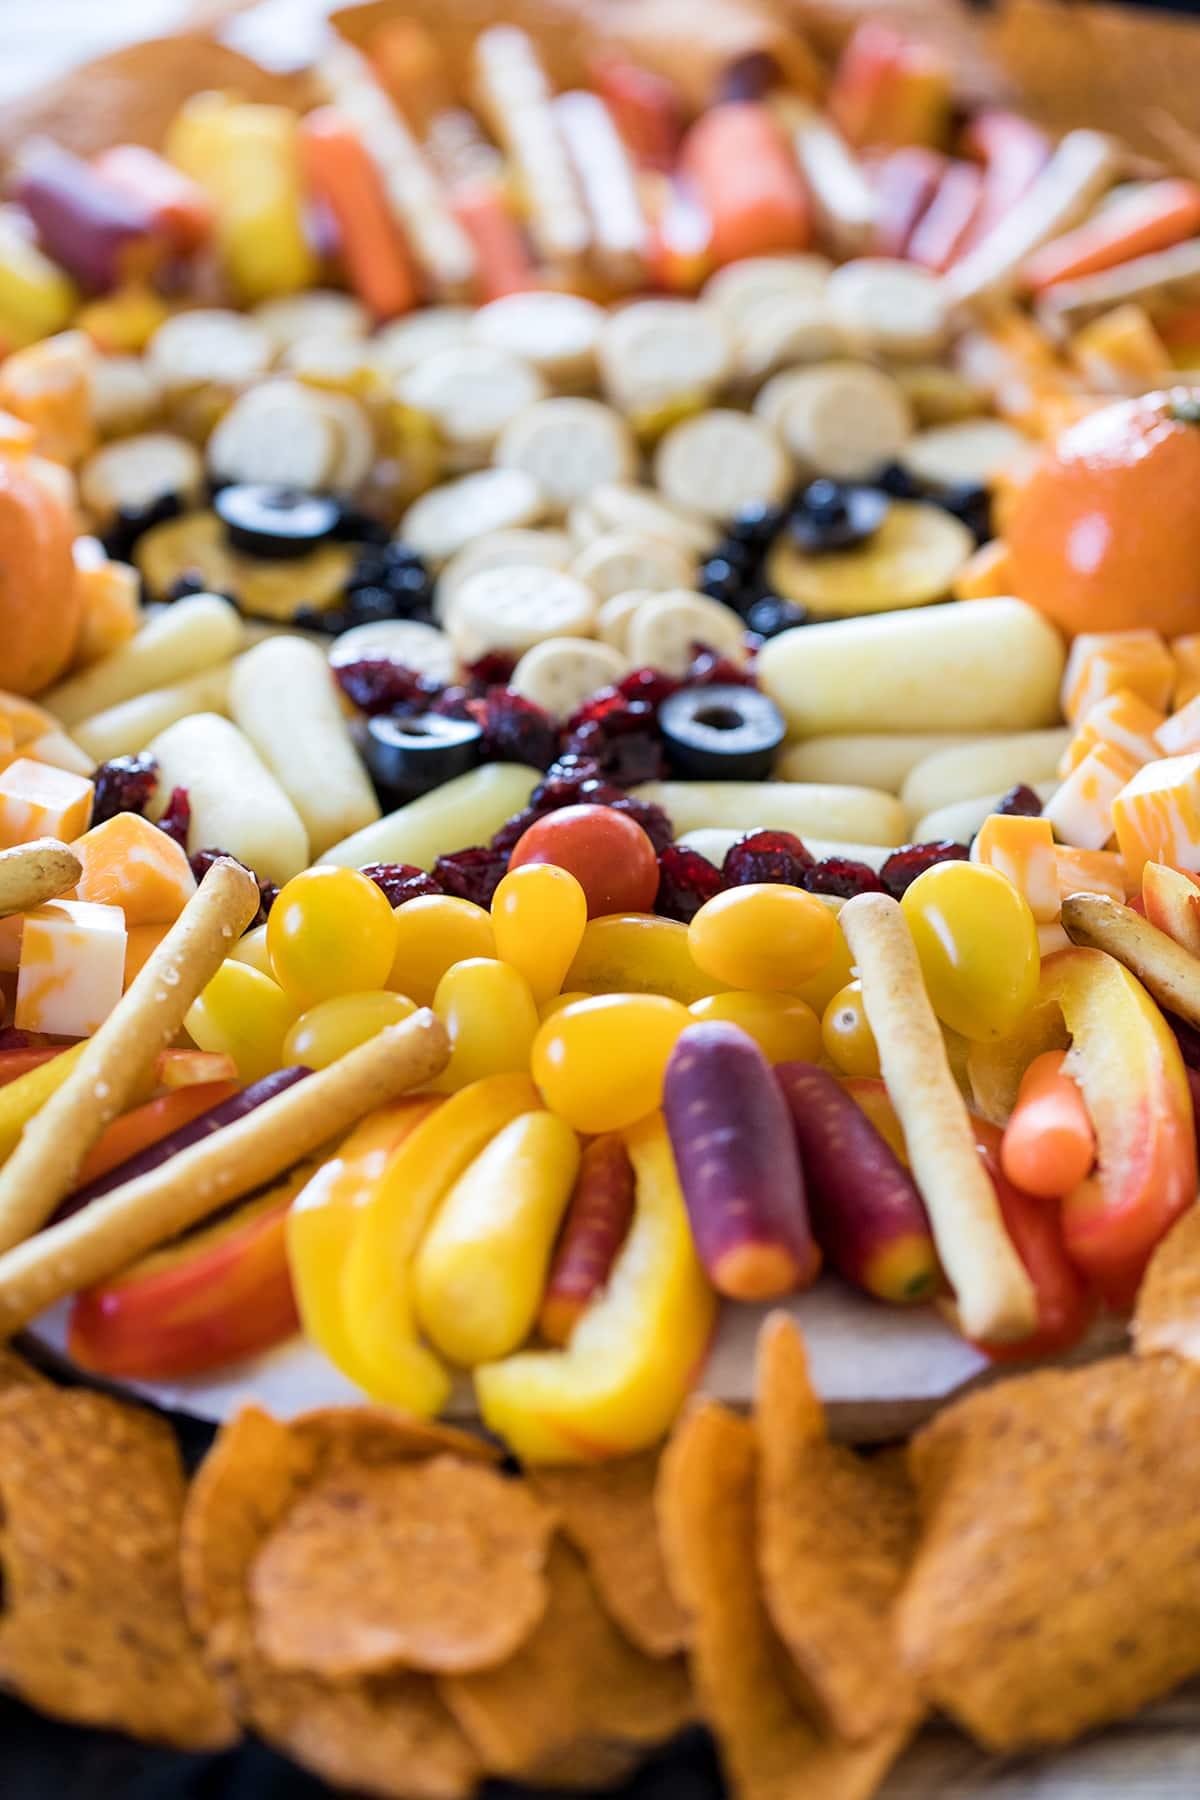 Disney's The Lion King Inspired Snack Board for Kids